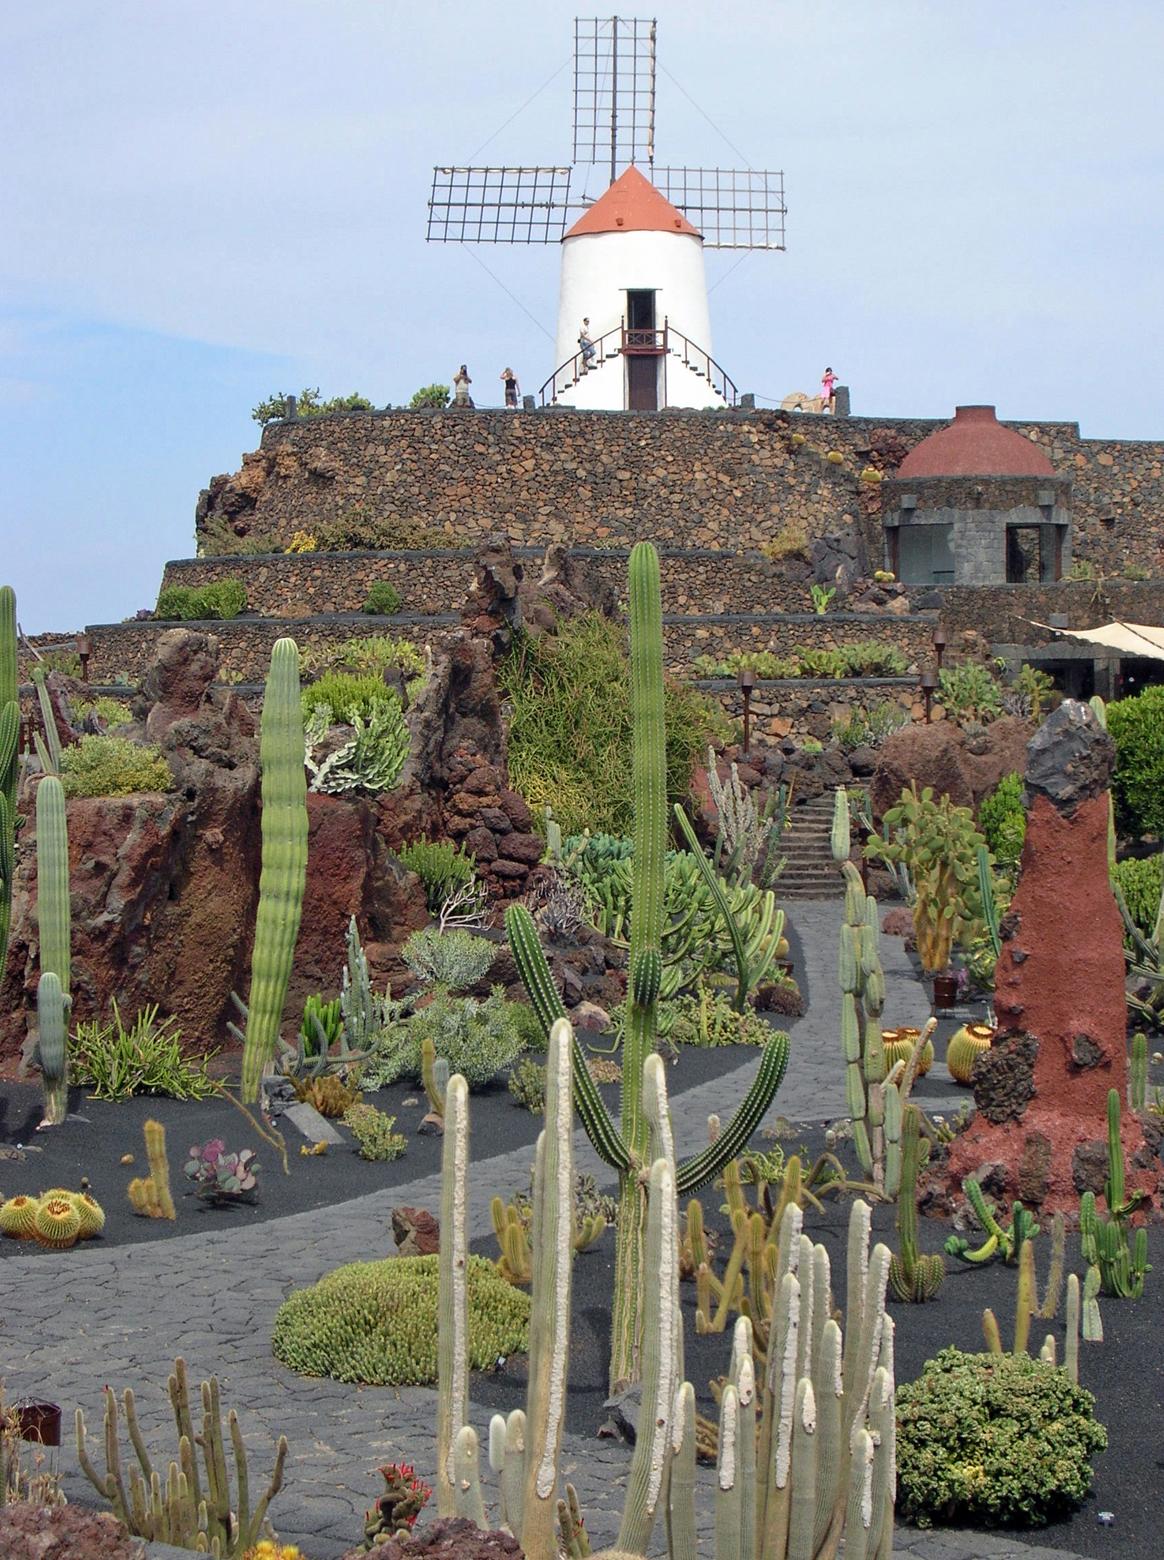 Das dorf guatiza auf lanzarote die sammlung von sukkulenten for Jardin de cactus lanzarote